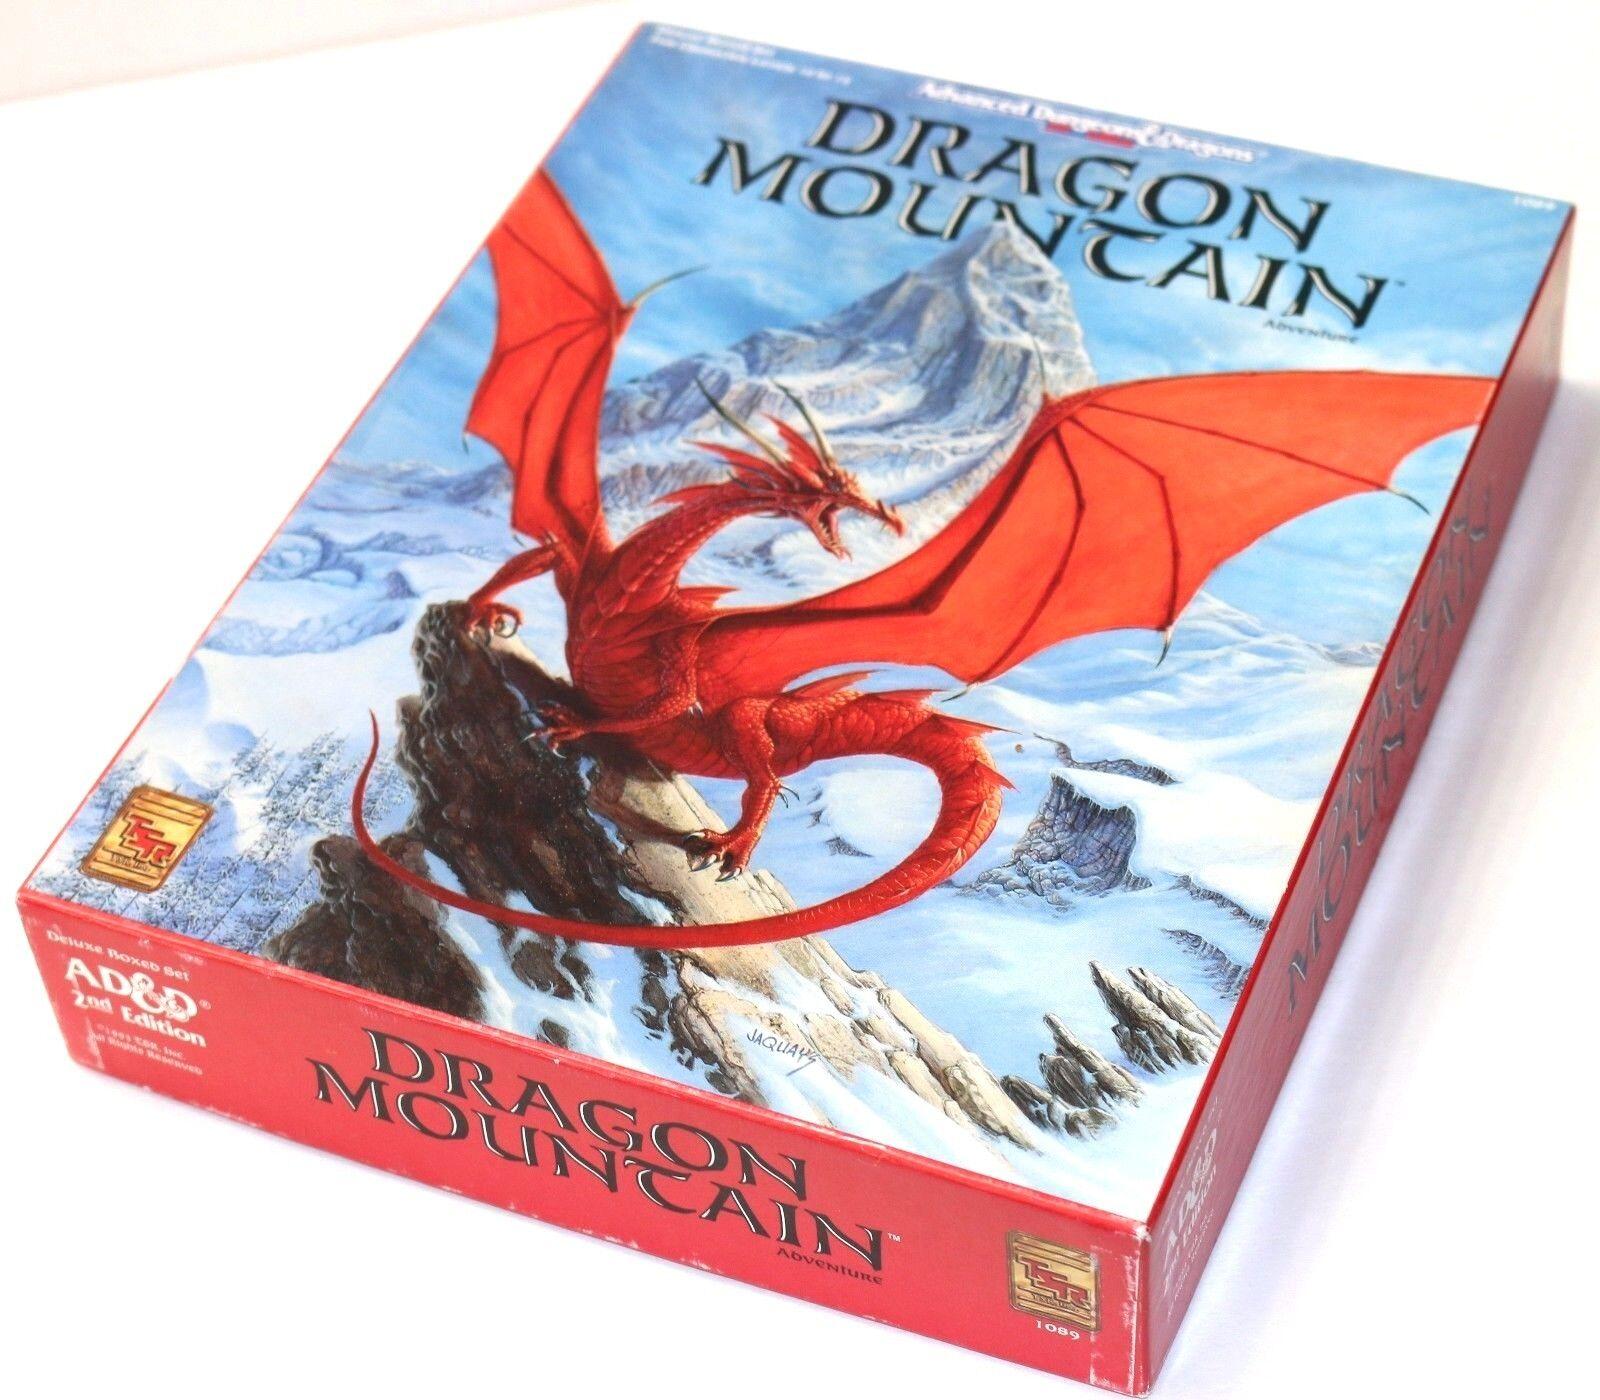 ADVANCED DUNGEONS & DRAGONS SET 2ND EDITION DRAGON MOUNTAIN ADVENTURE TSR-1089